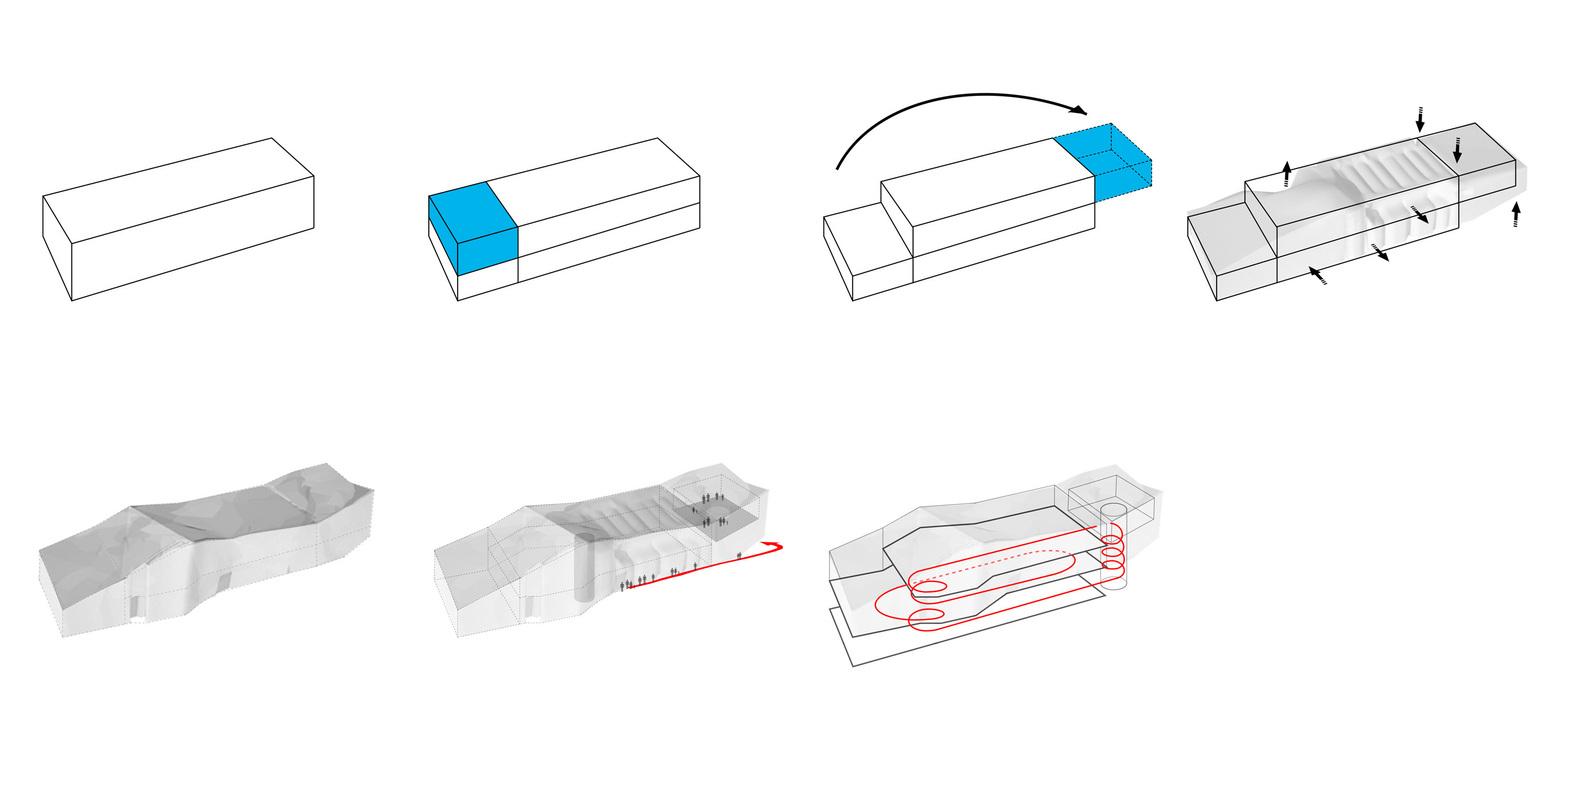 muttenz water purification plant / oppenheim architecture + design  diagram